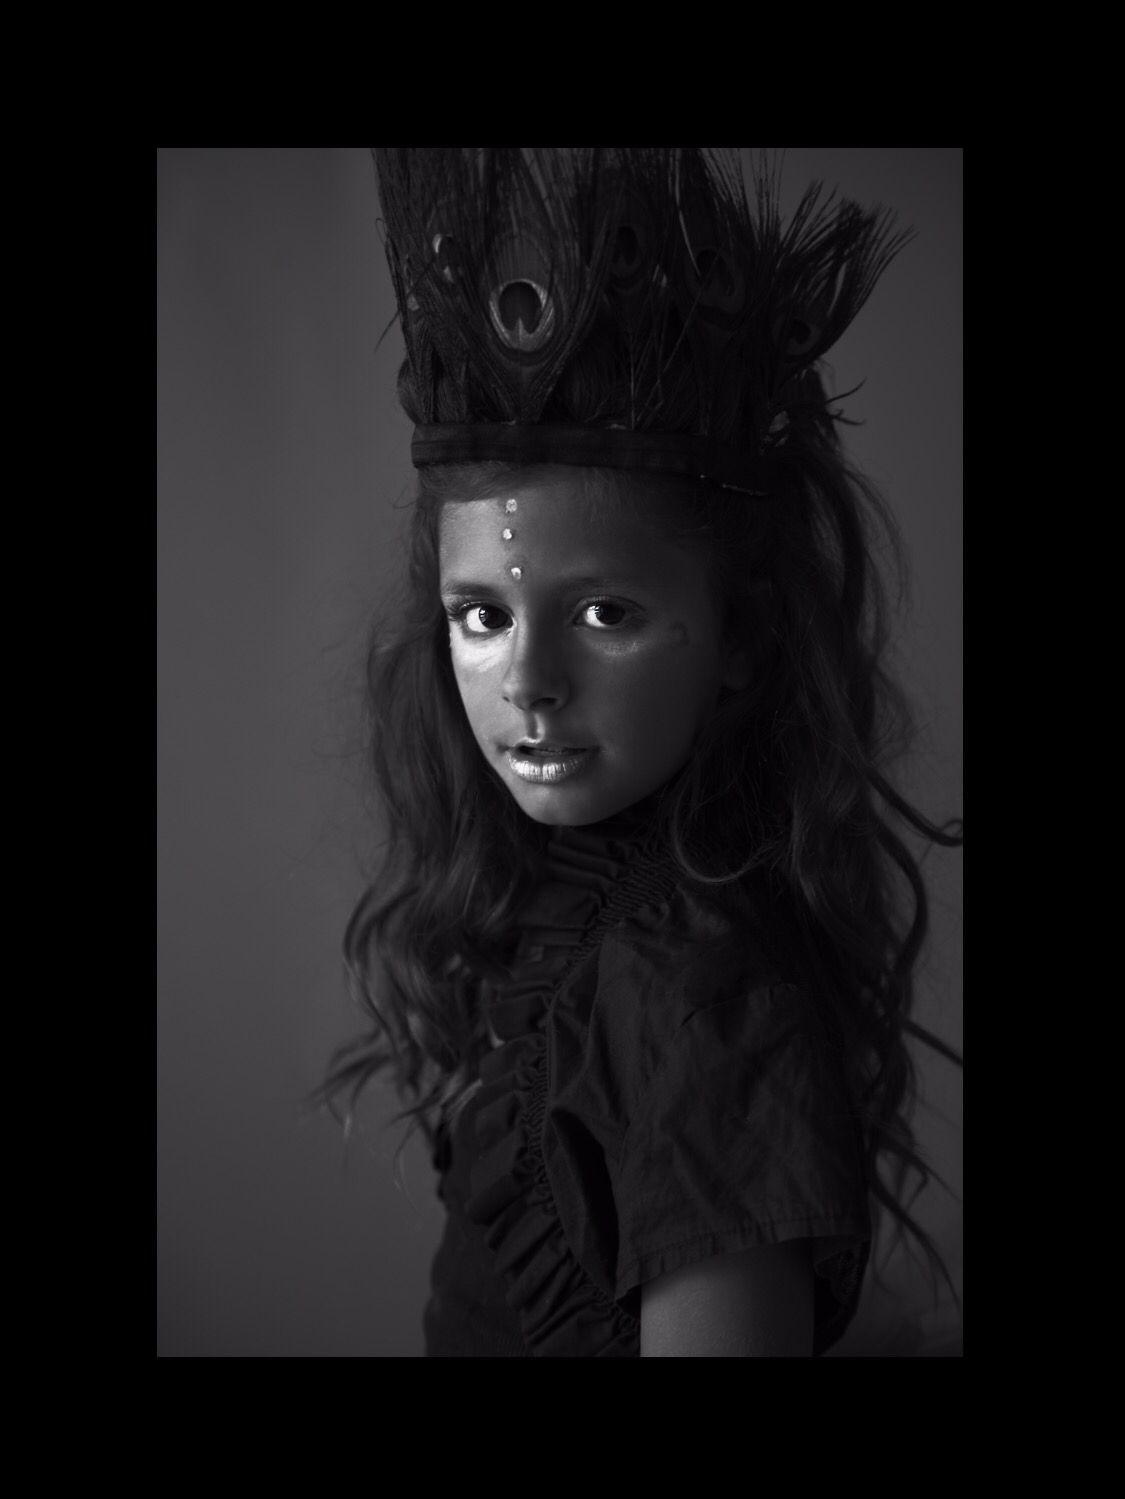 Model Brooklyn - photographer Misti Van Zandt w/ VanZandt Studios  #photography #child #tribal #portrait #vanzandtstudios #model #pose #concept #styled #kidmodel #girl #blackandwhite #lighting #pictures #mini #highfashion #commercial #editorial #feathers #photographer #brooklyn #houseofbrooklyn